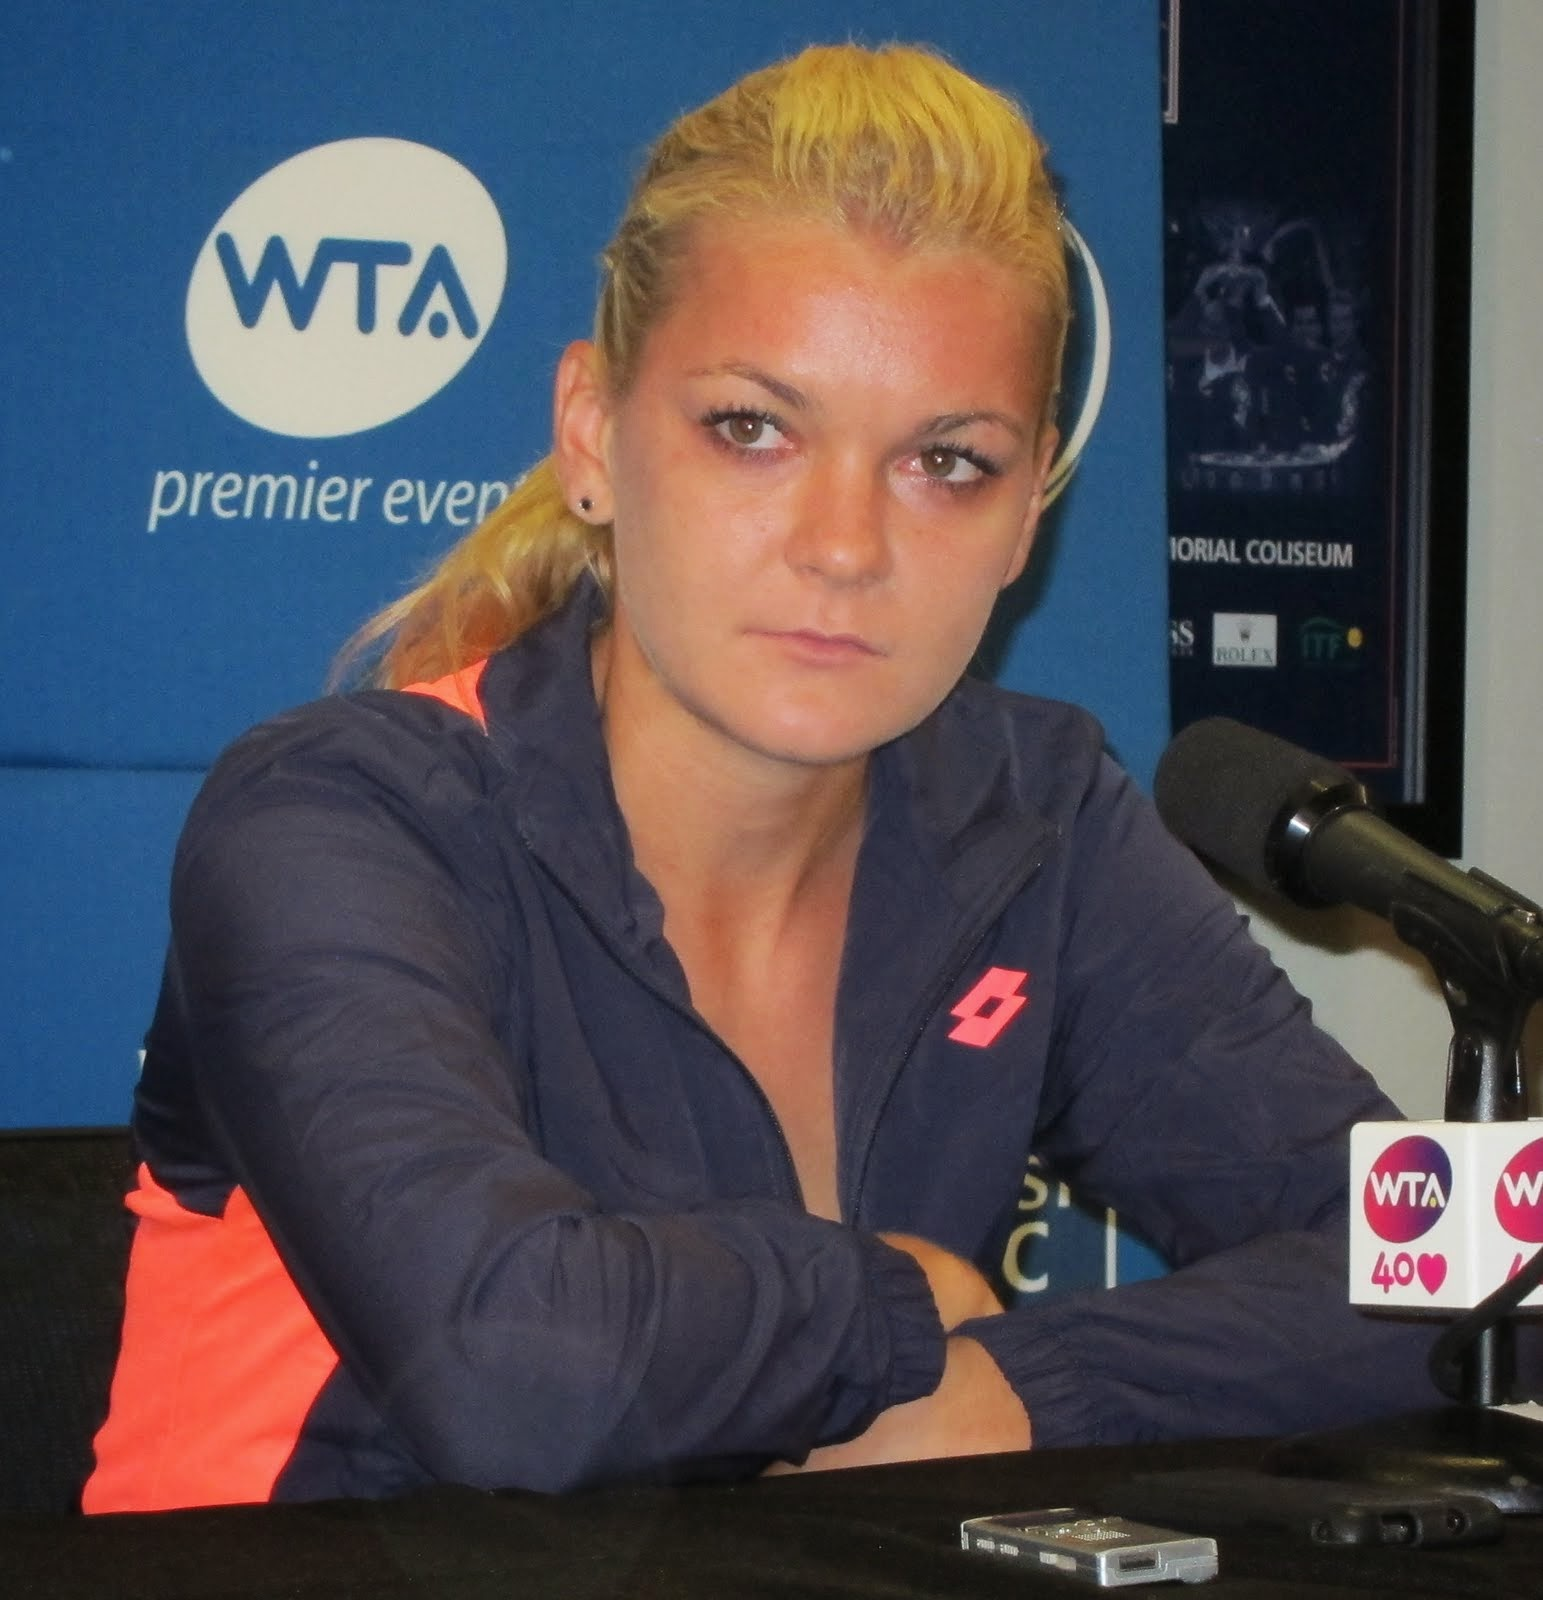 U.S. Open Day 3 highlights: No. 4 Radwanska ousted